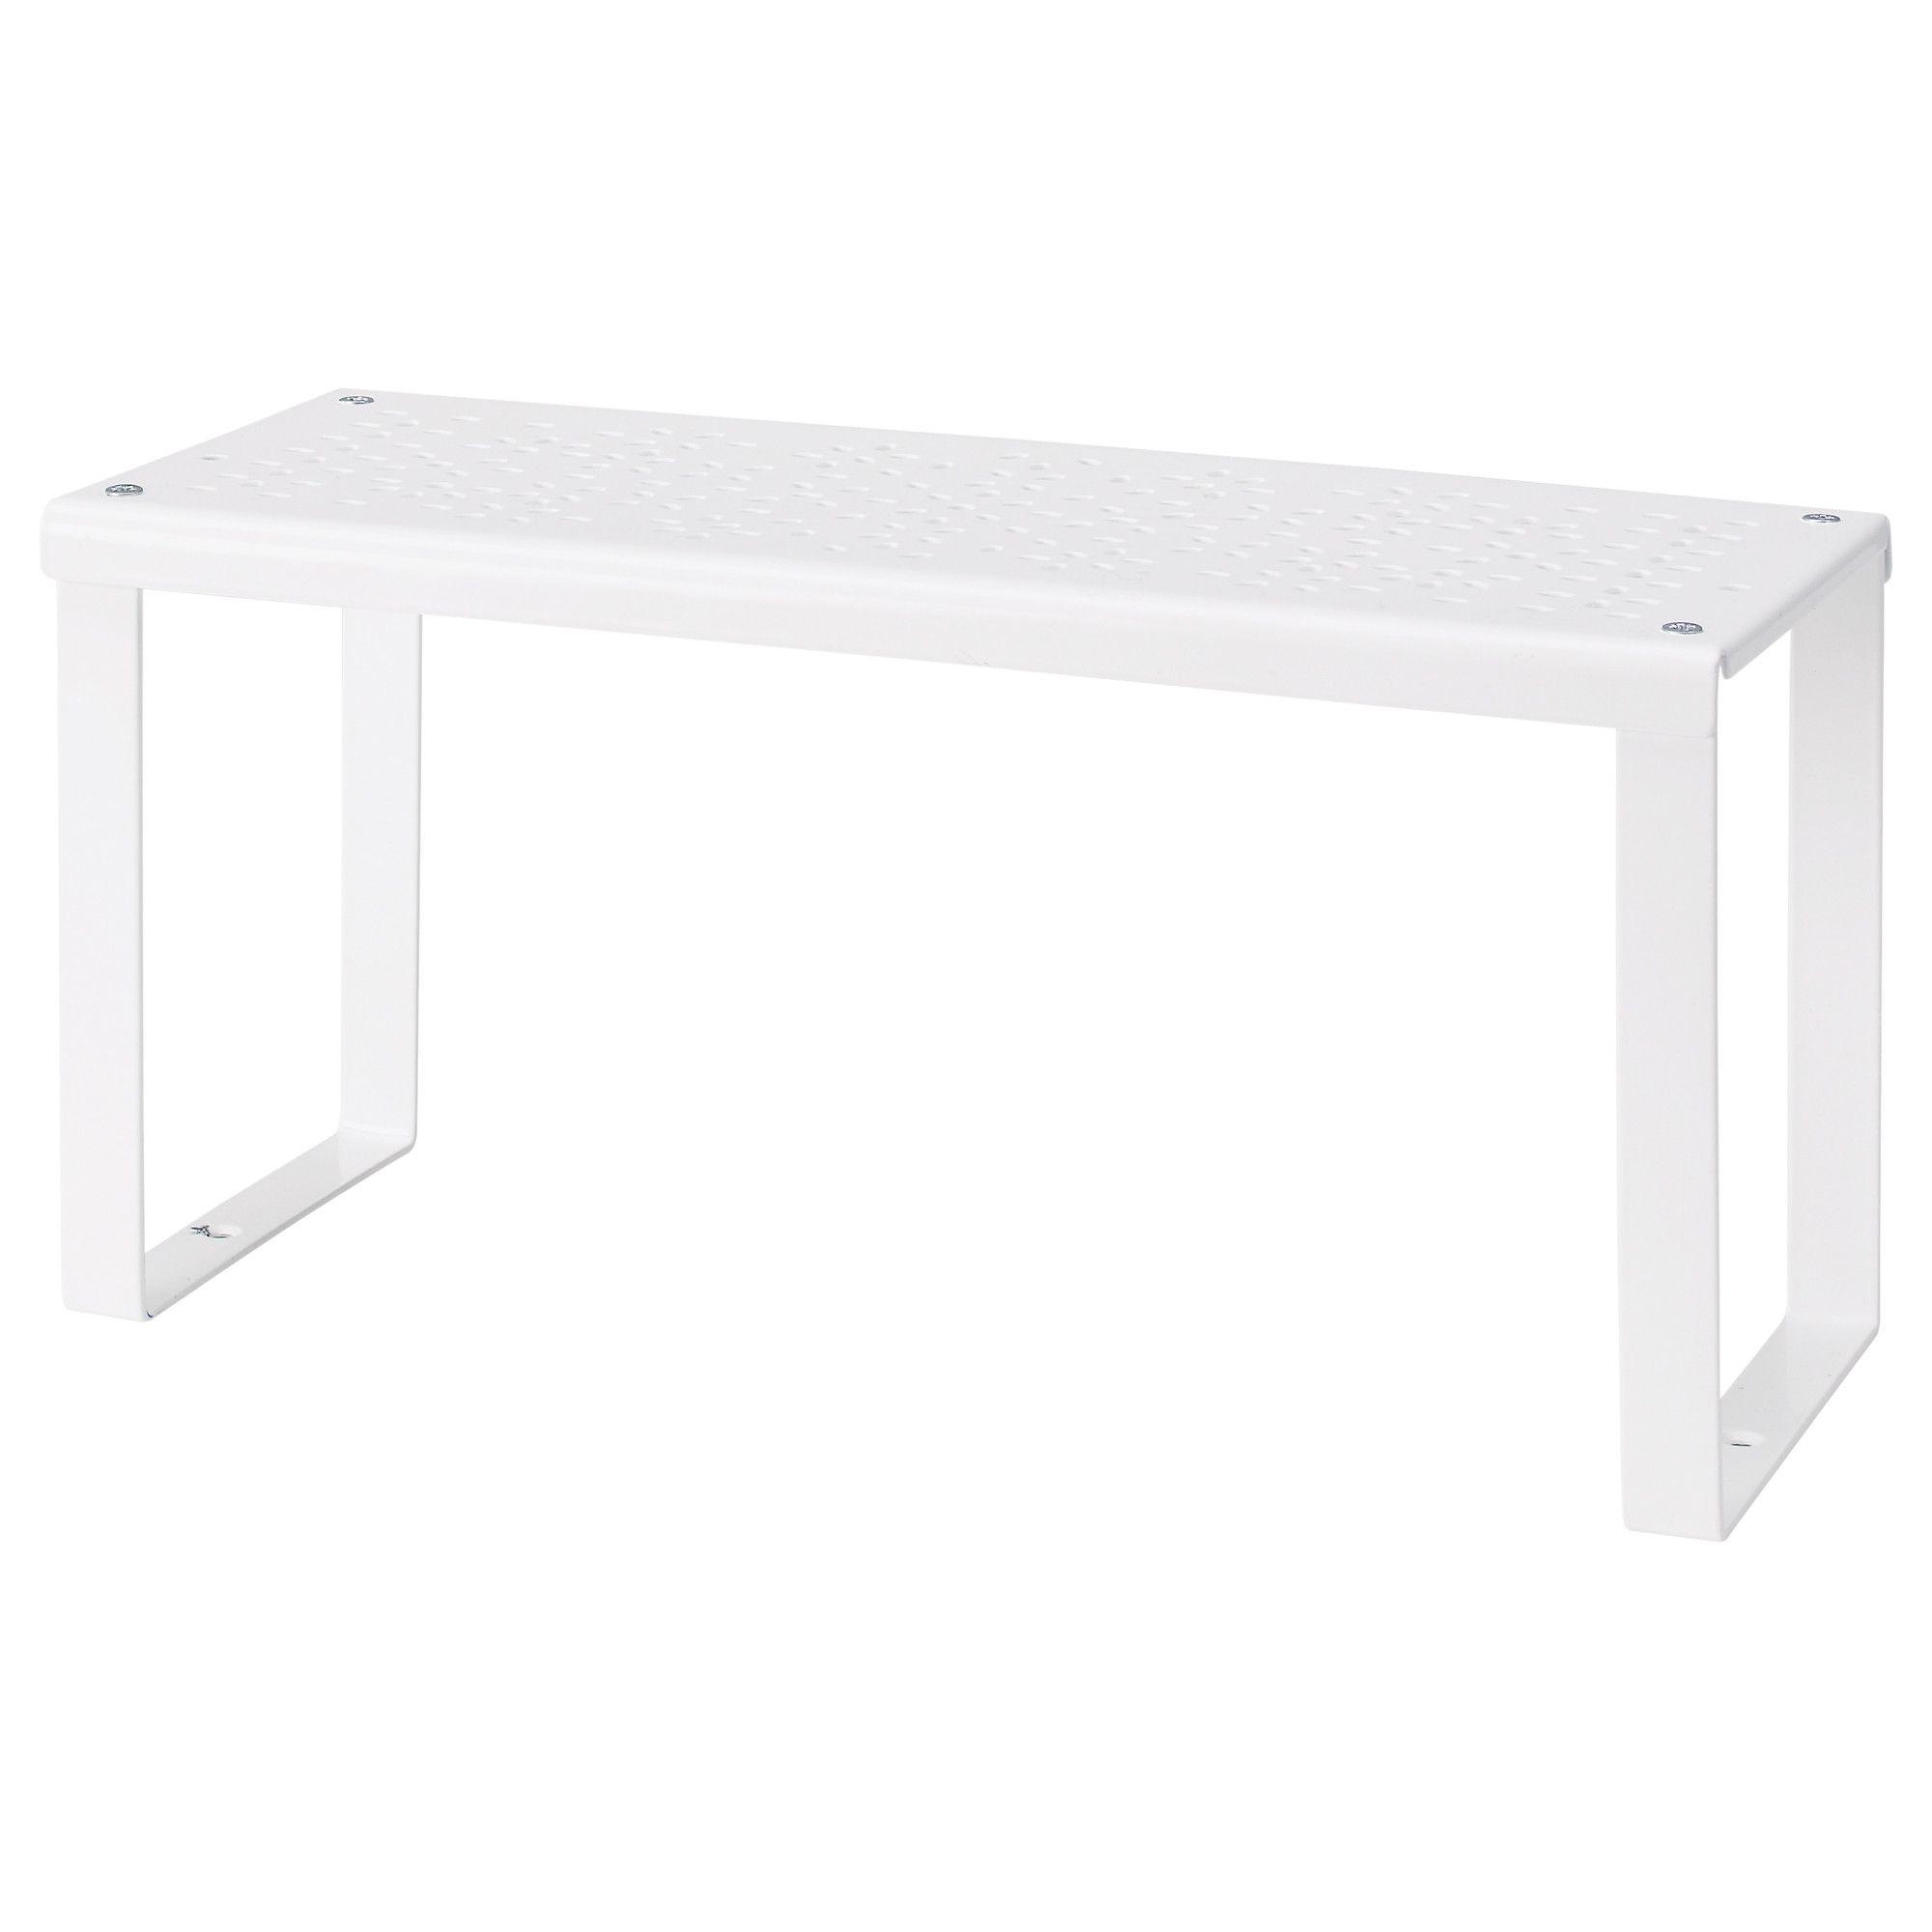 variera shelf insert white i need ya at ikea pinterest profondeur hauteur et rangement. Black Bedroom Furniture Sets. Home Design Ideas